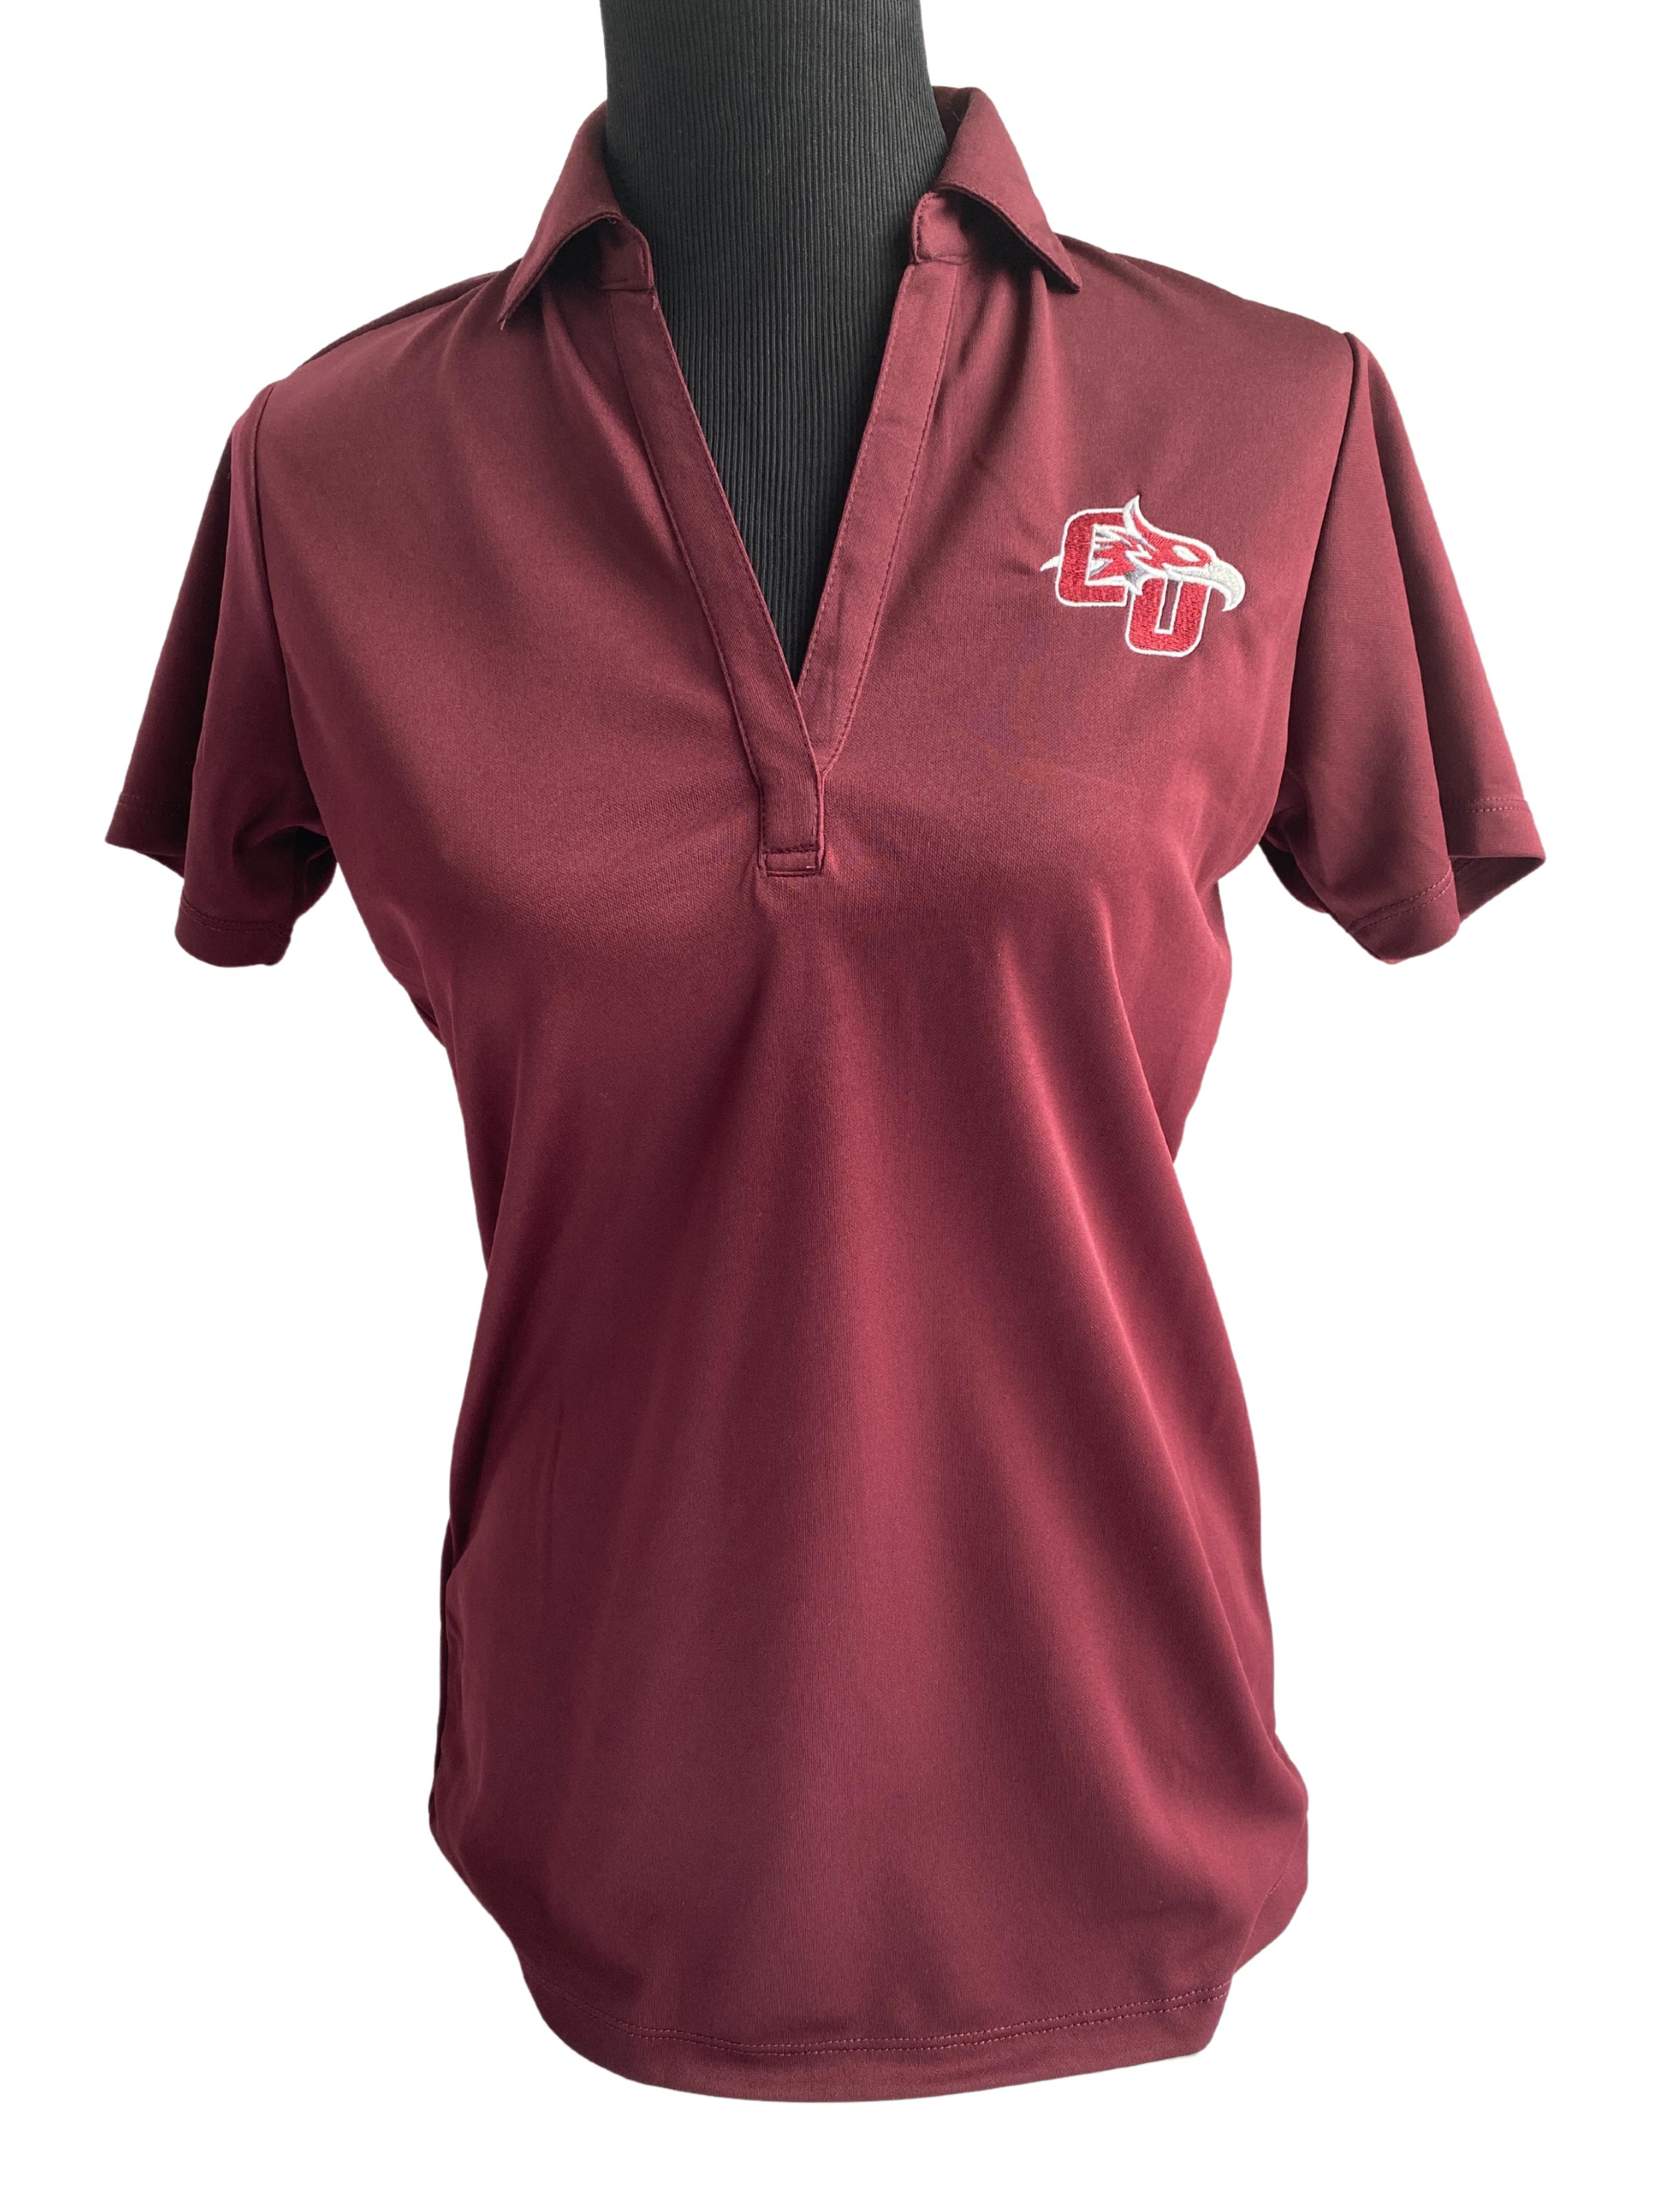 CU Logo Women's Polo